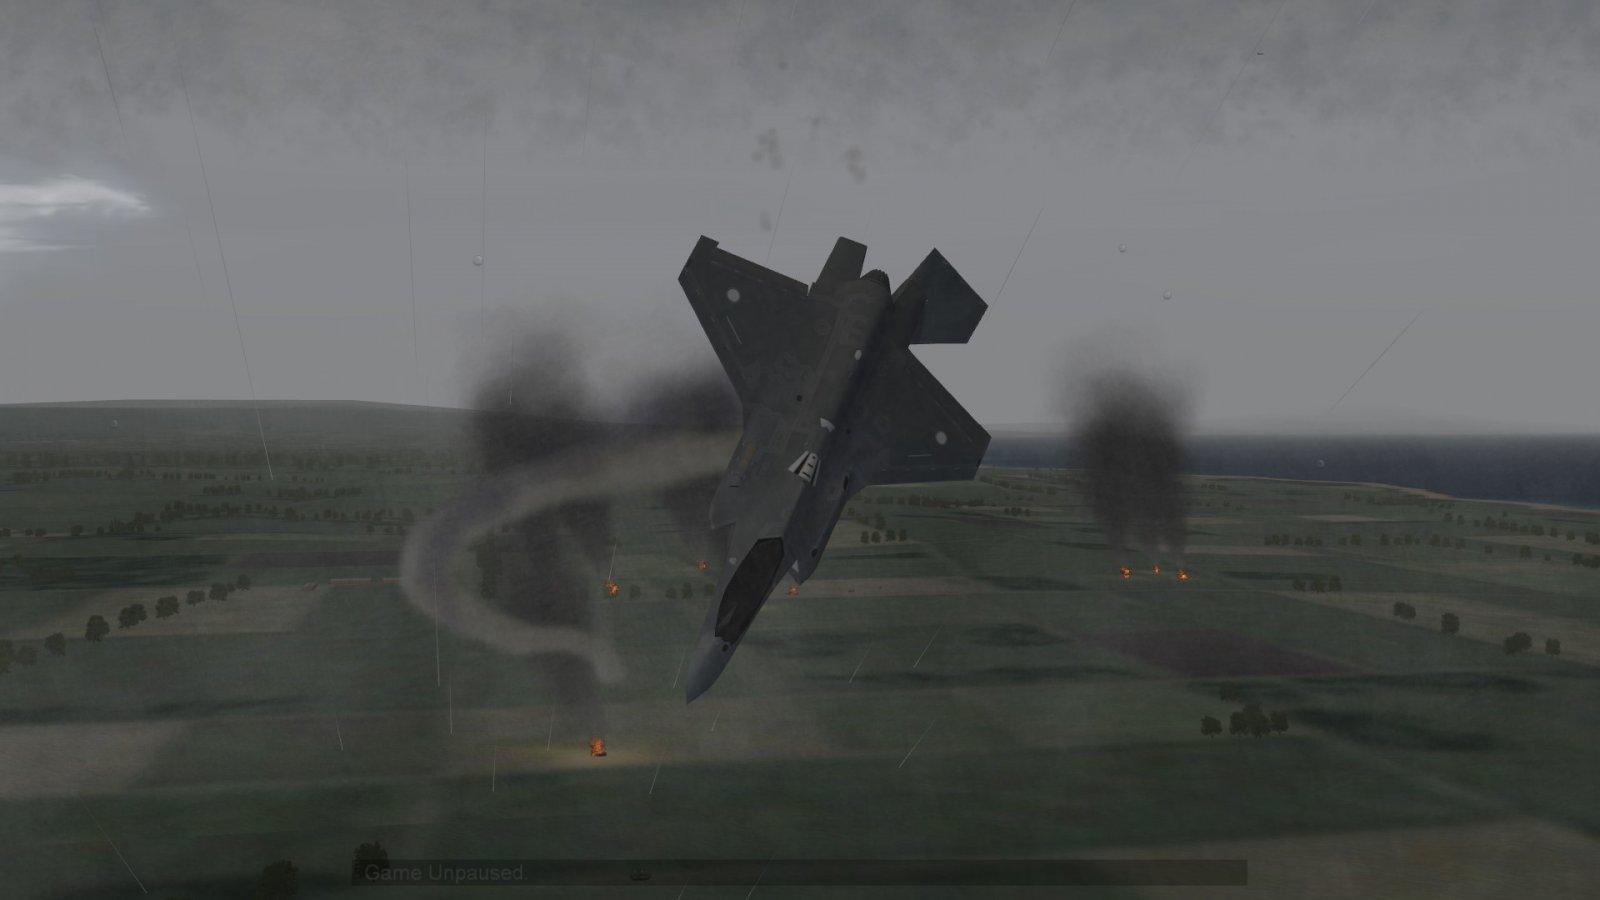 Tumbling F-35A Leaving Behind Smoke